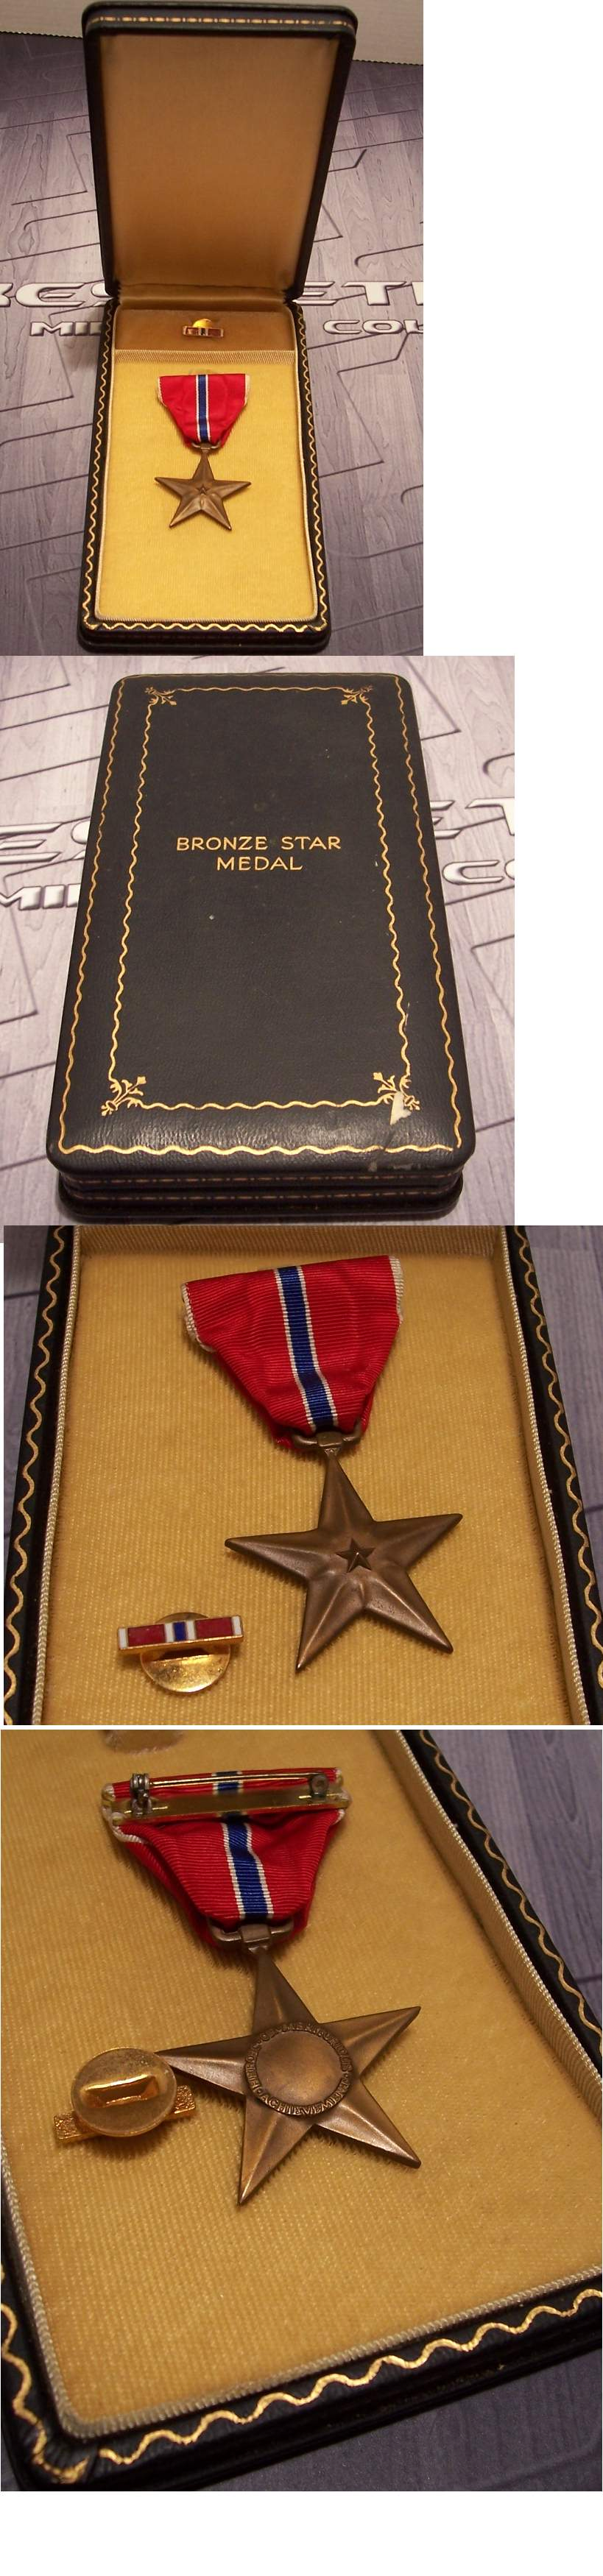 Cased US Bronze Star